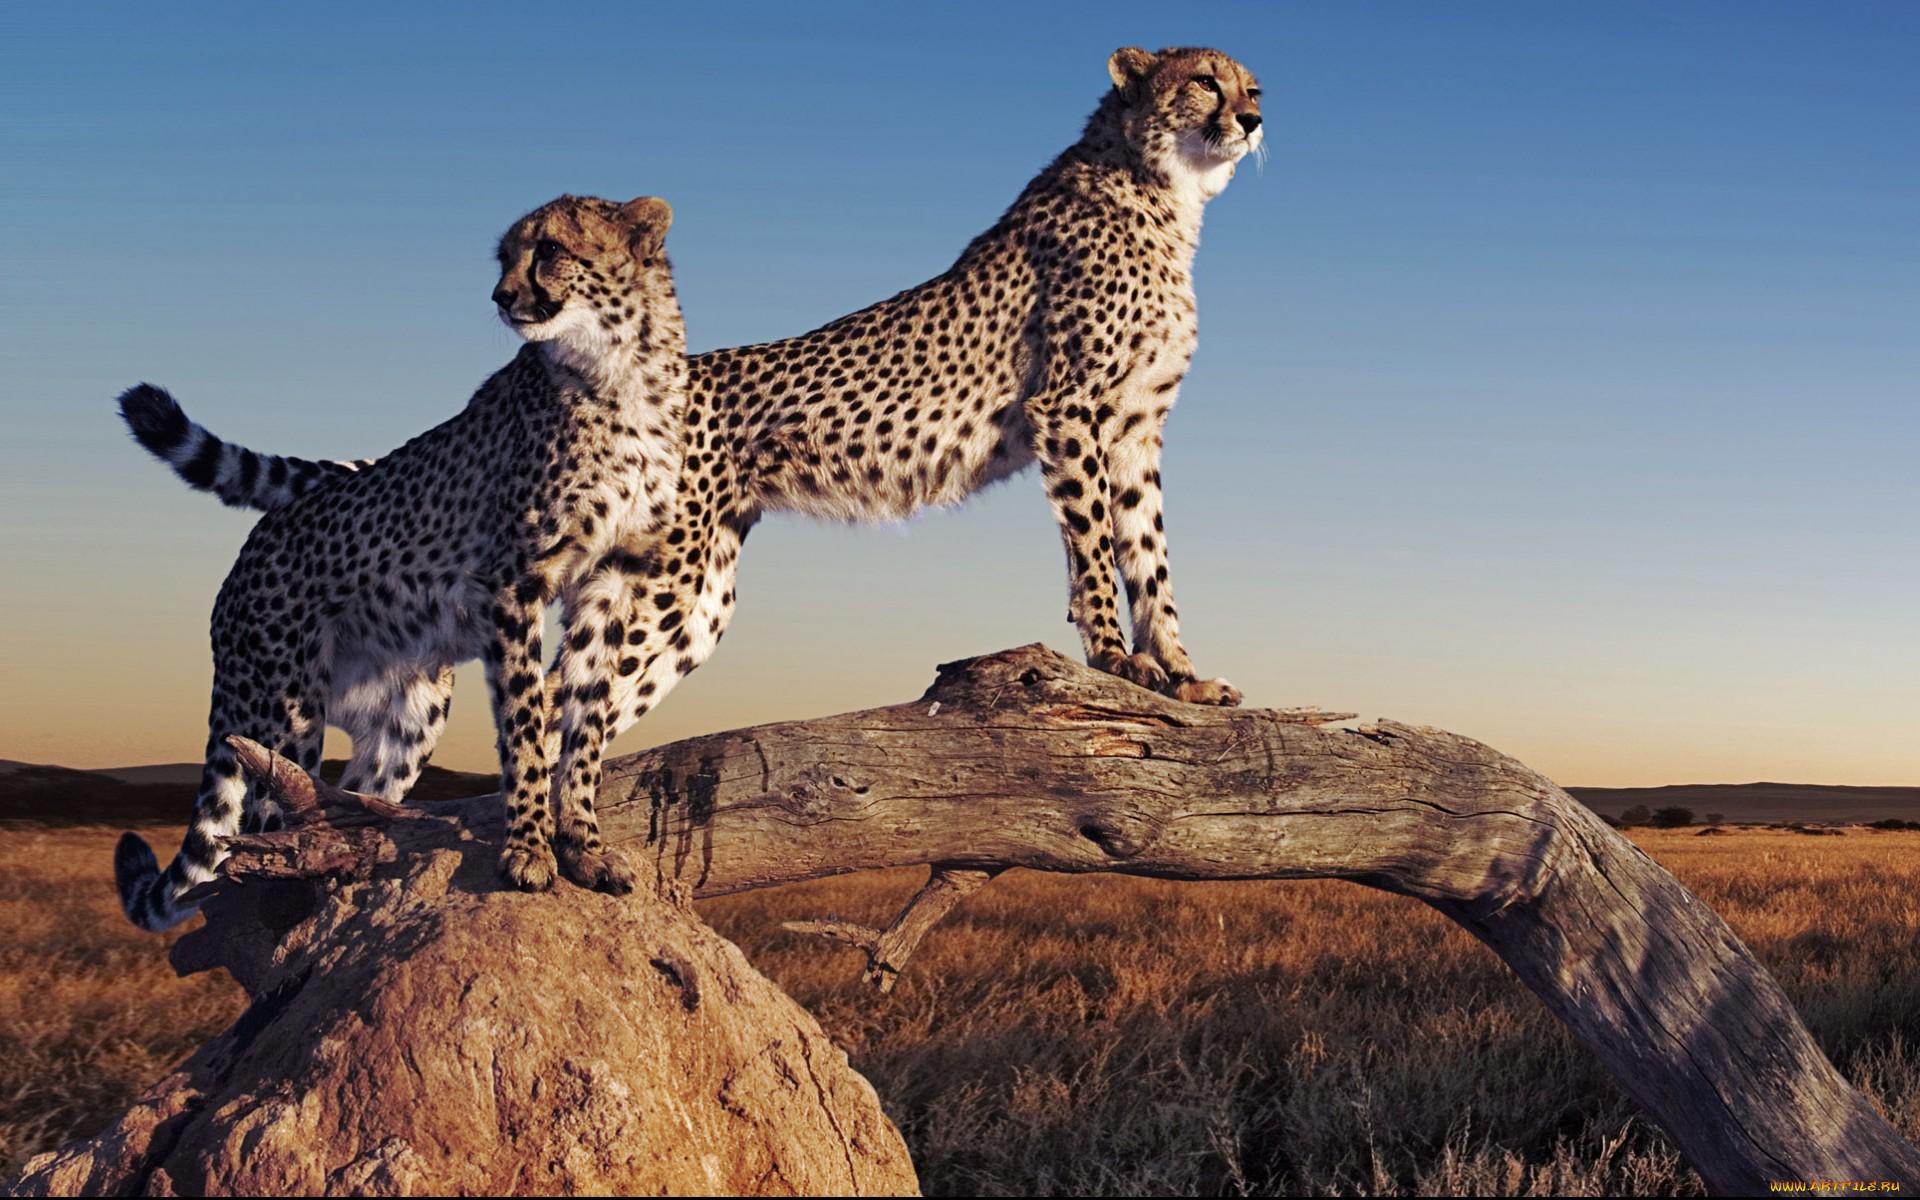 3d Wallpaper For Laptop Full Screen Cheetah Wallpaper